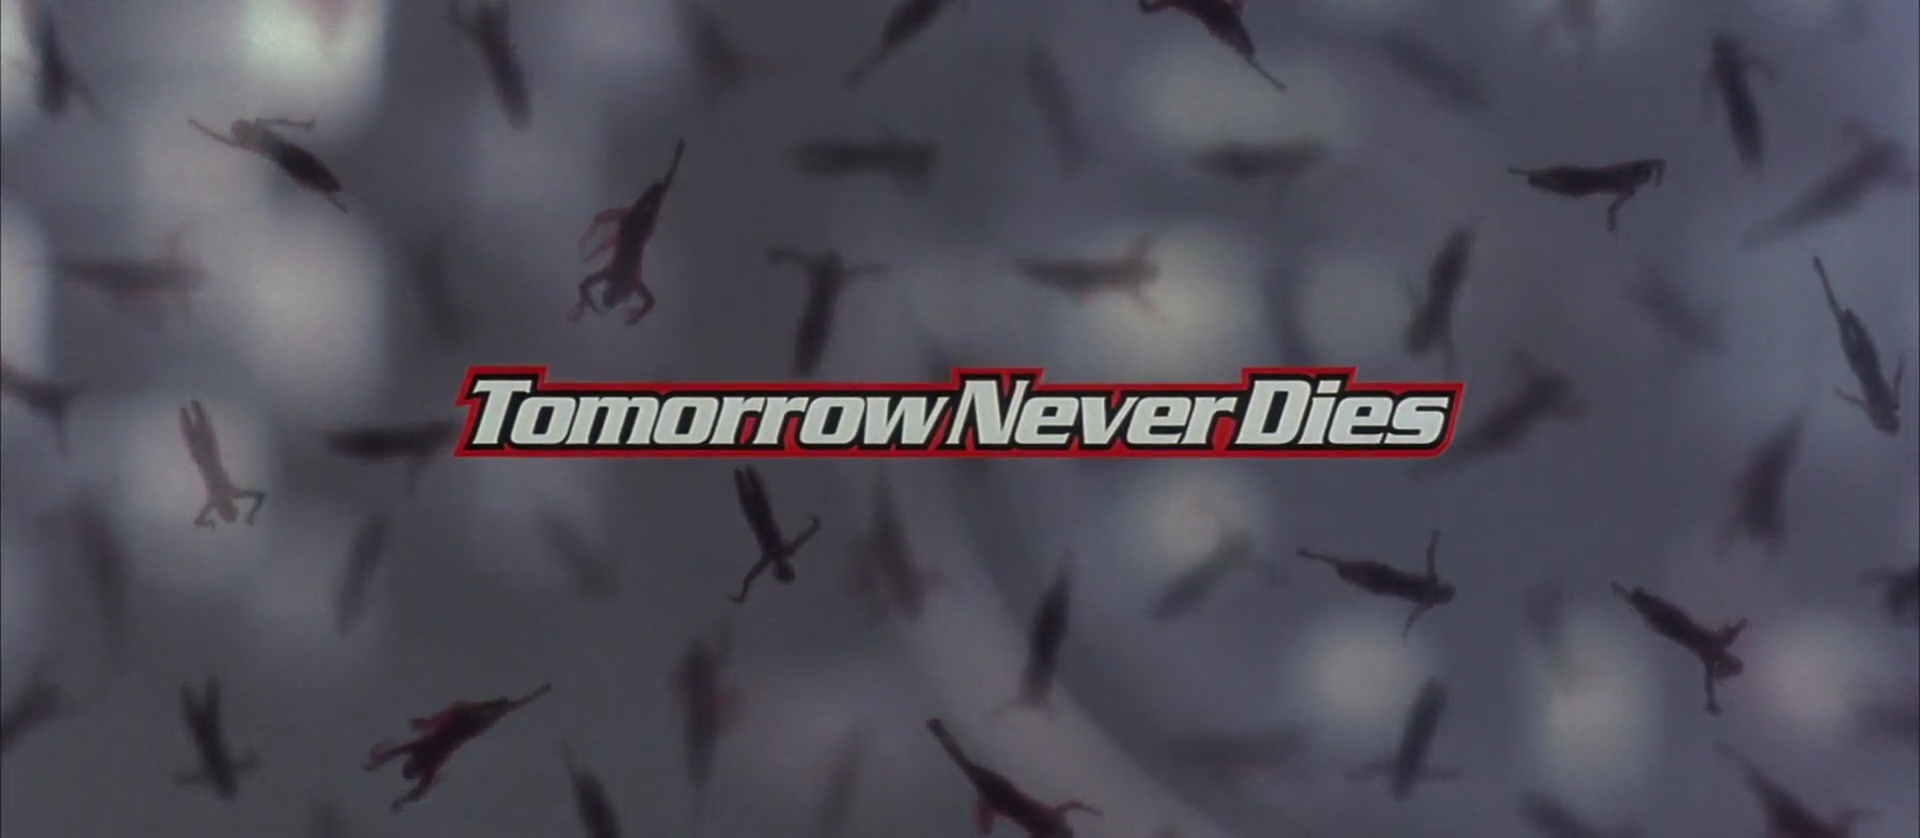 DEMAIN NE MEURT JAMAIS (Tomorrow Never Dies) de Roger Spottiswoode (1997)